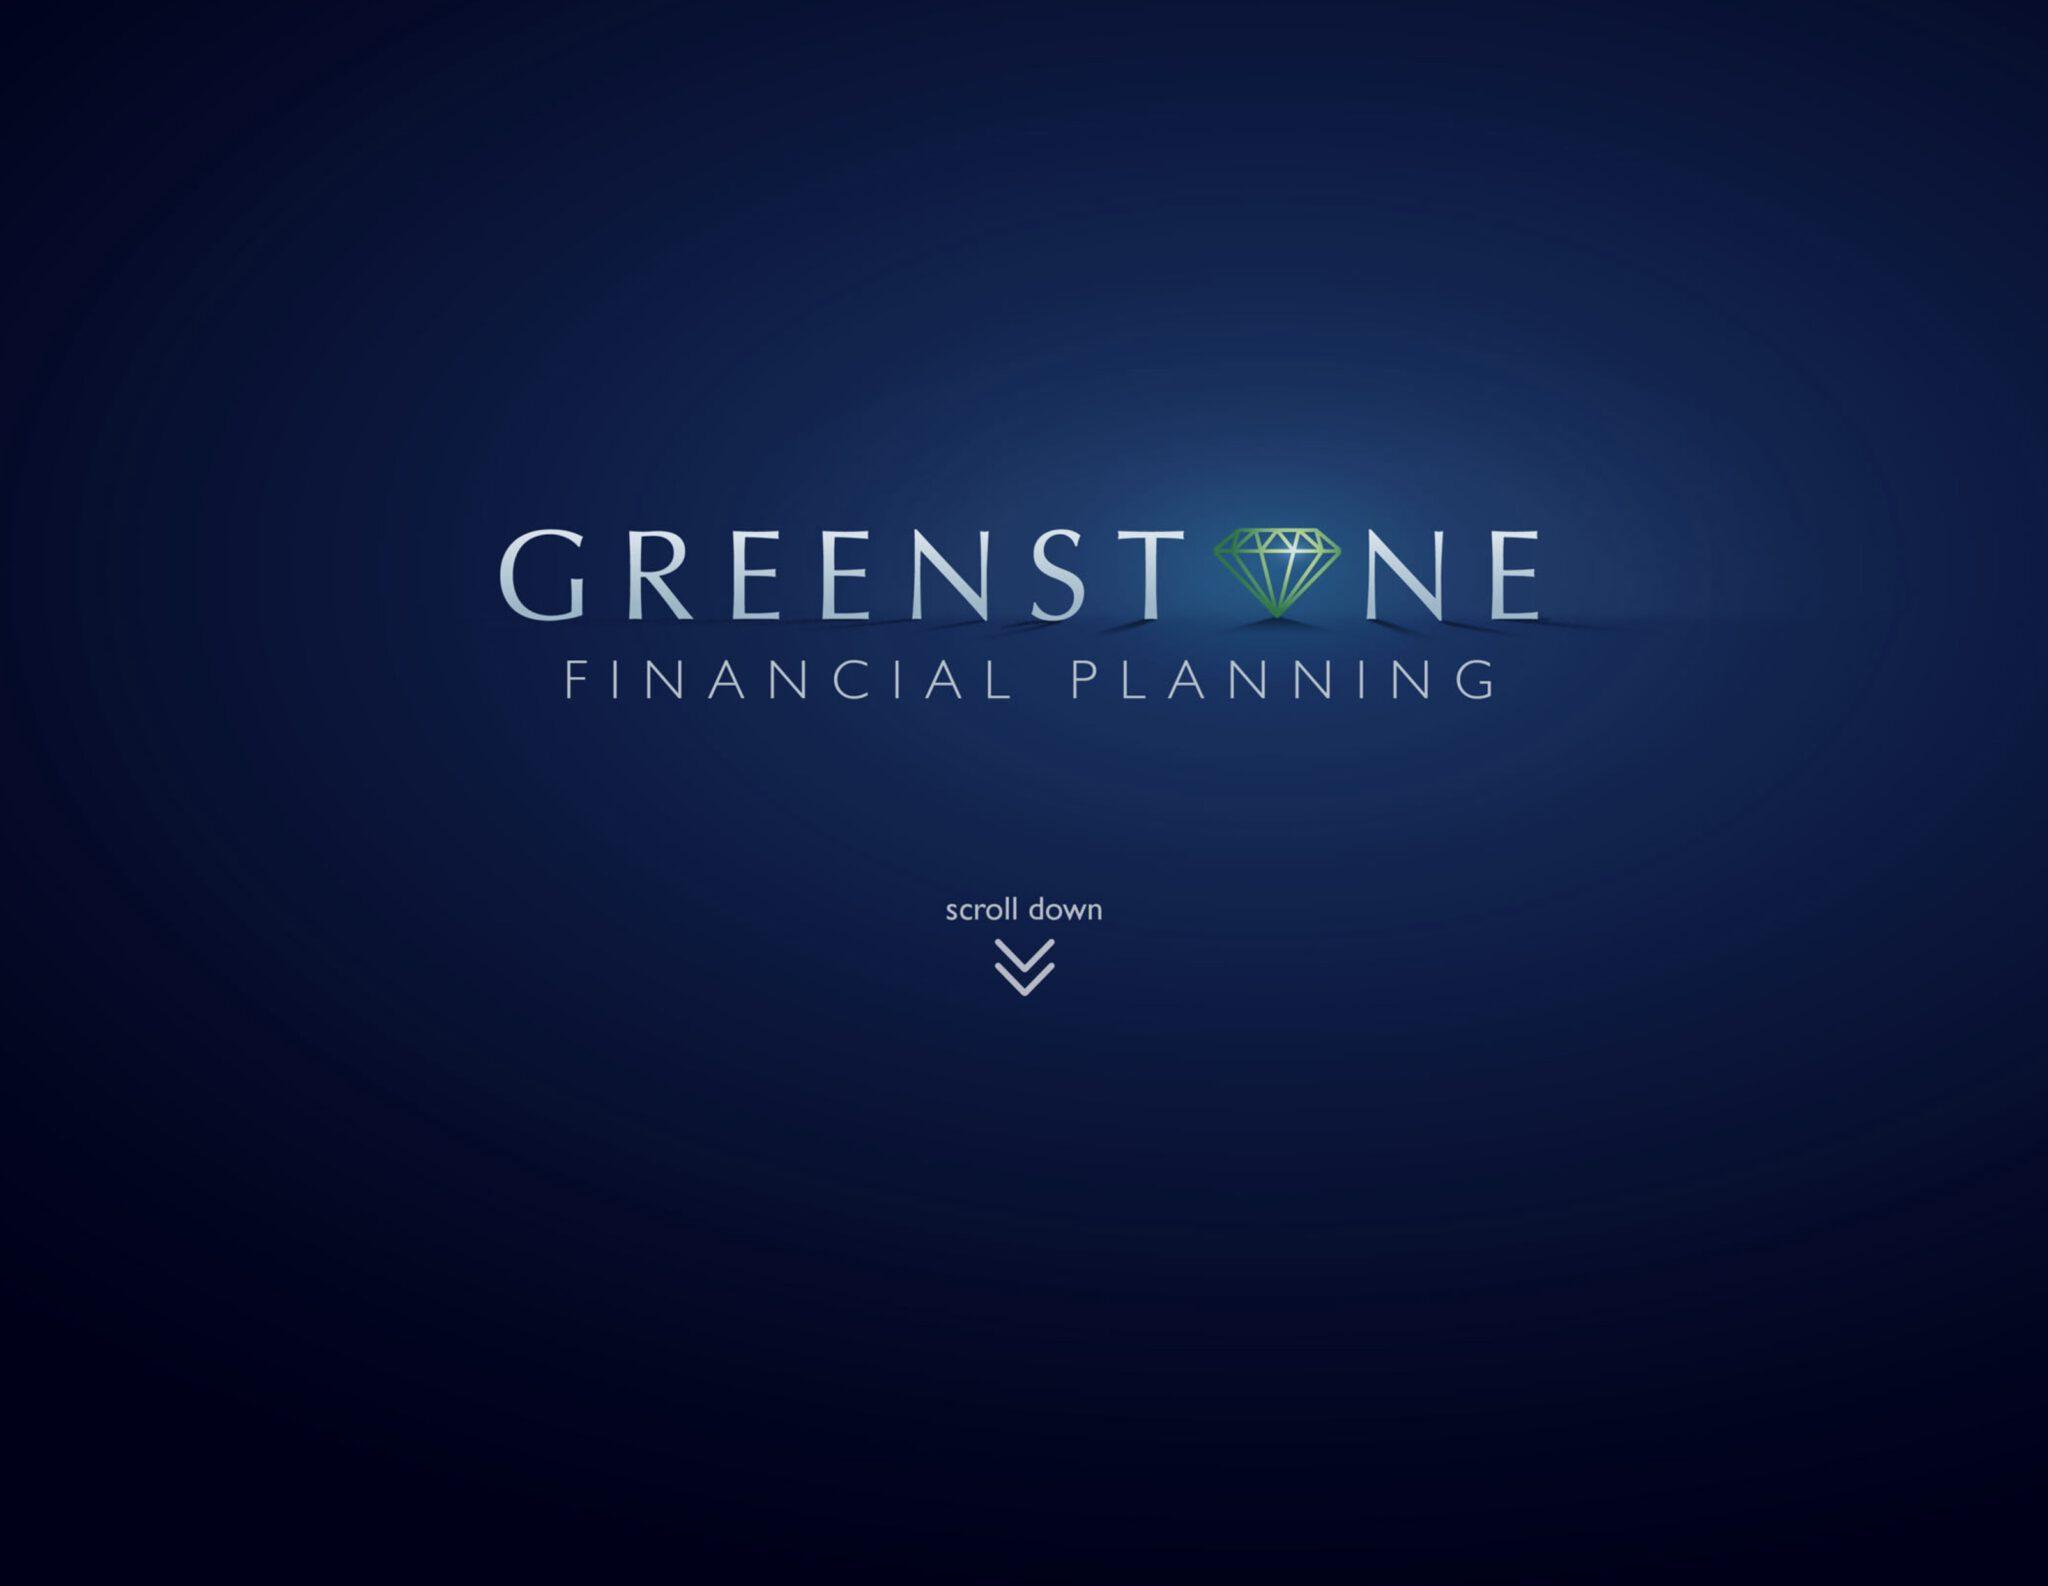 Image of Greenstone